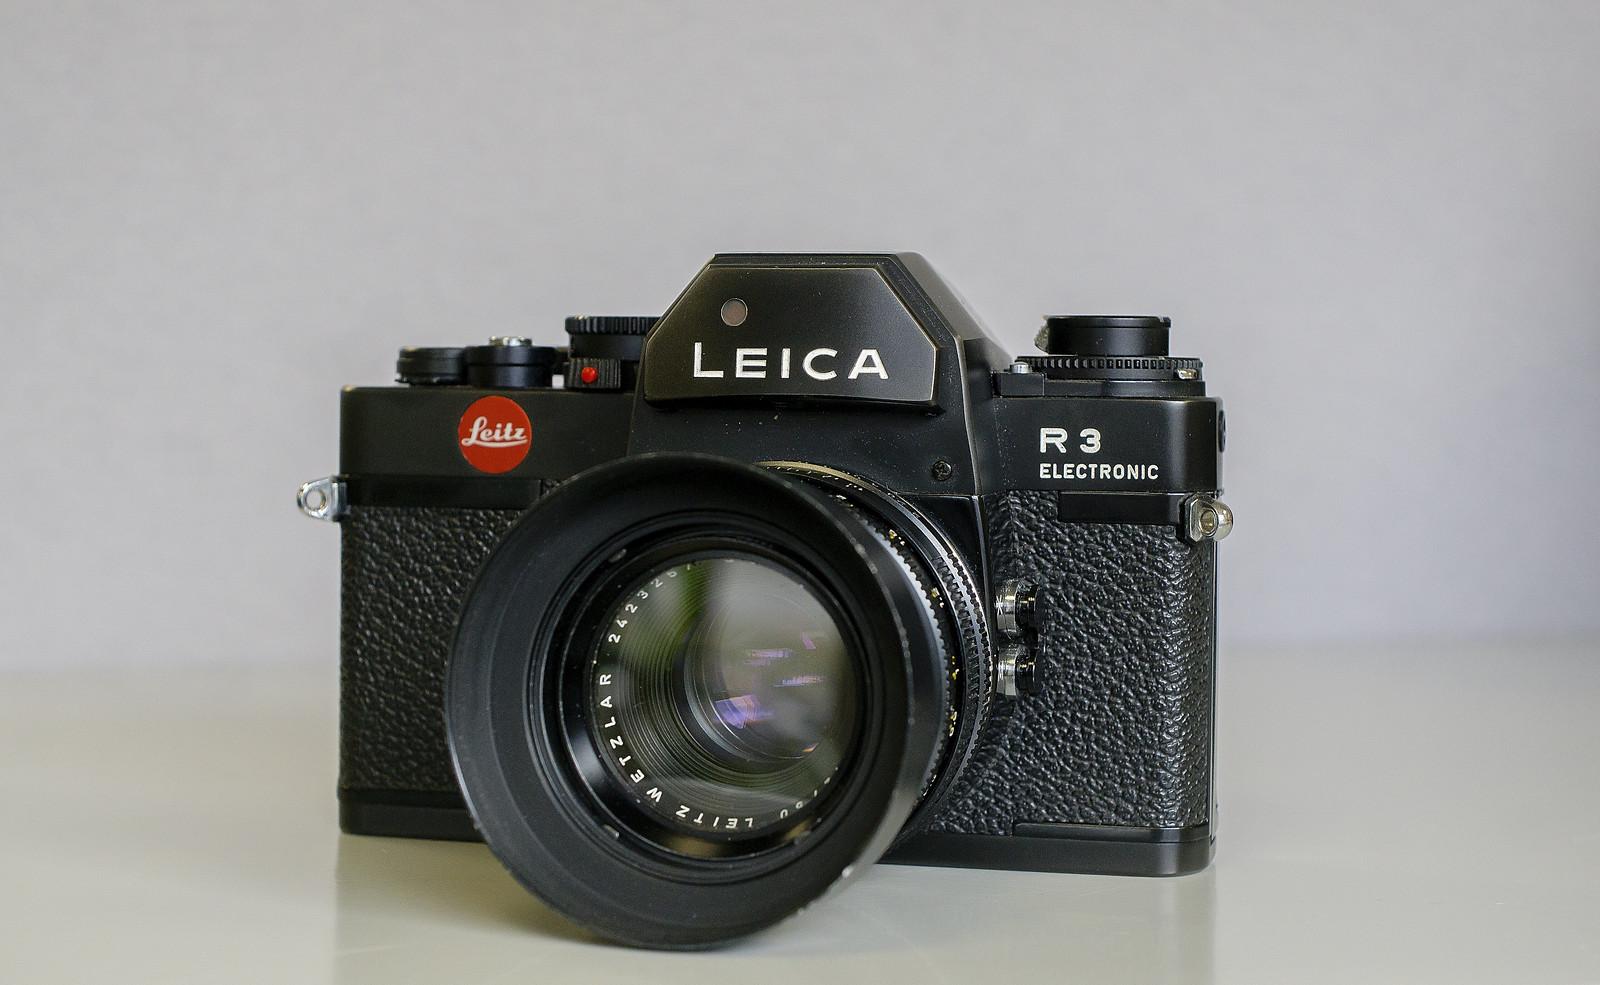 Camera Review Blog No. 56 - Ernst Leitz Leica R3 Electronic